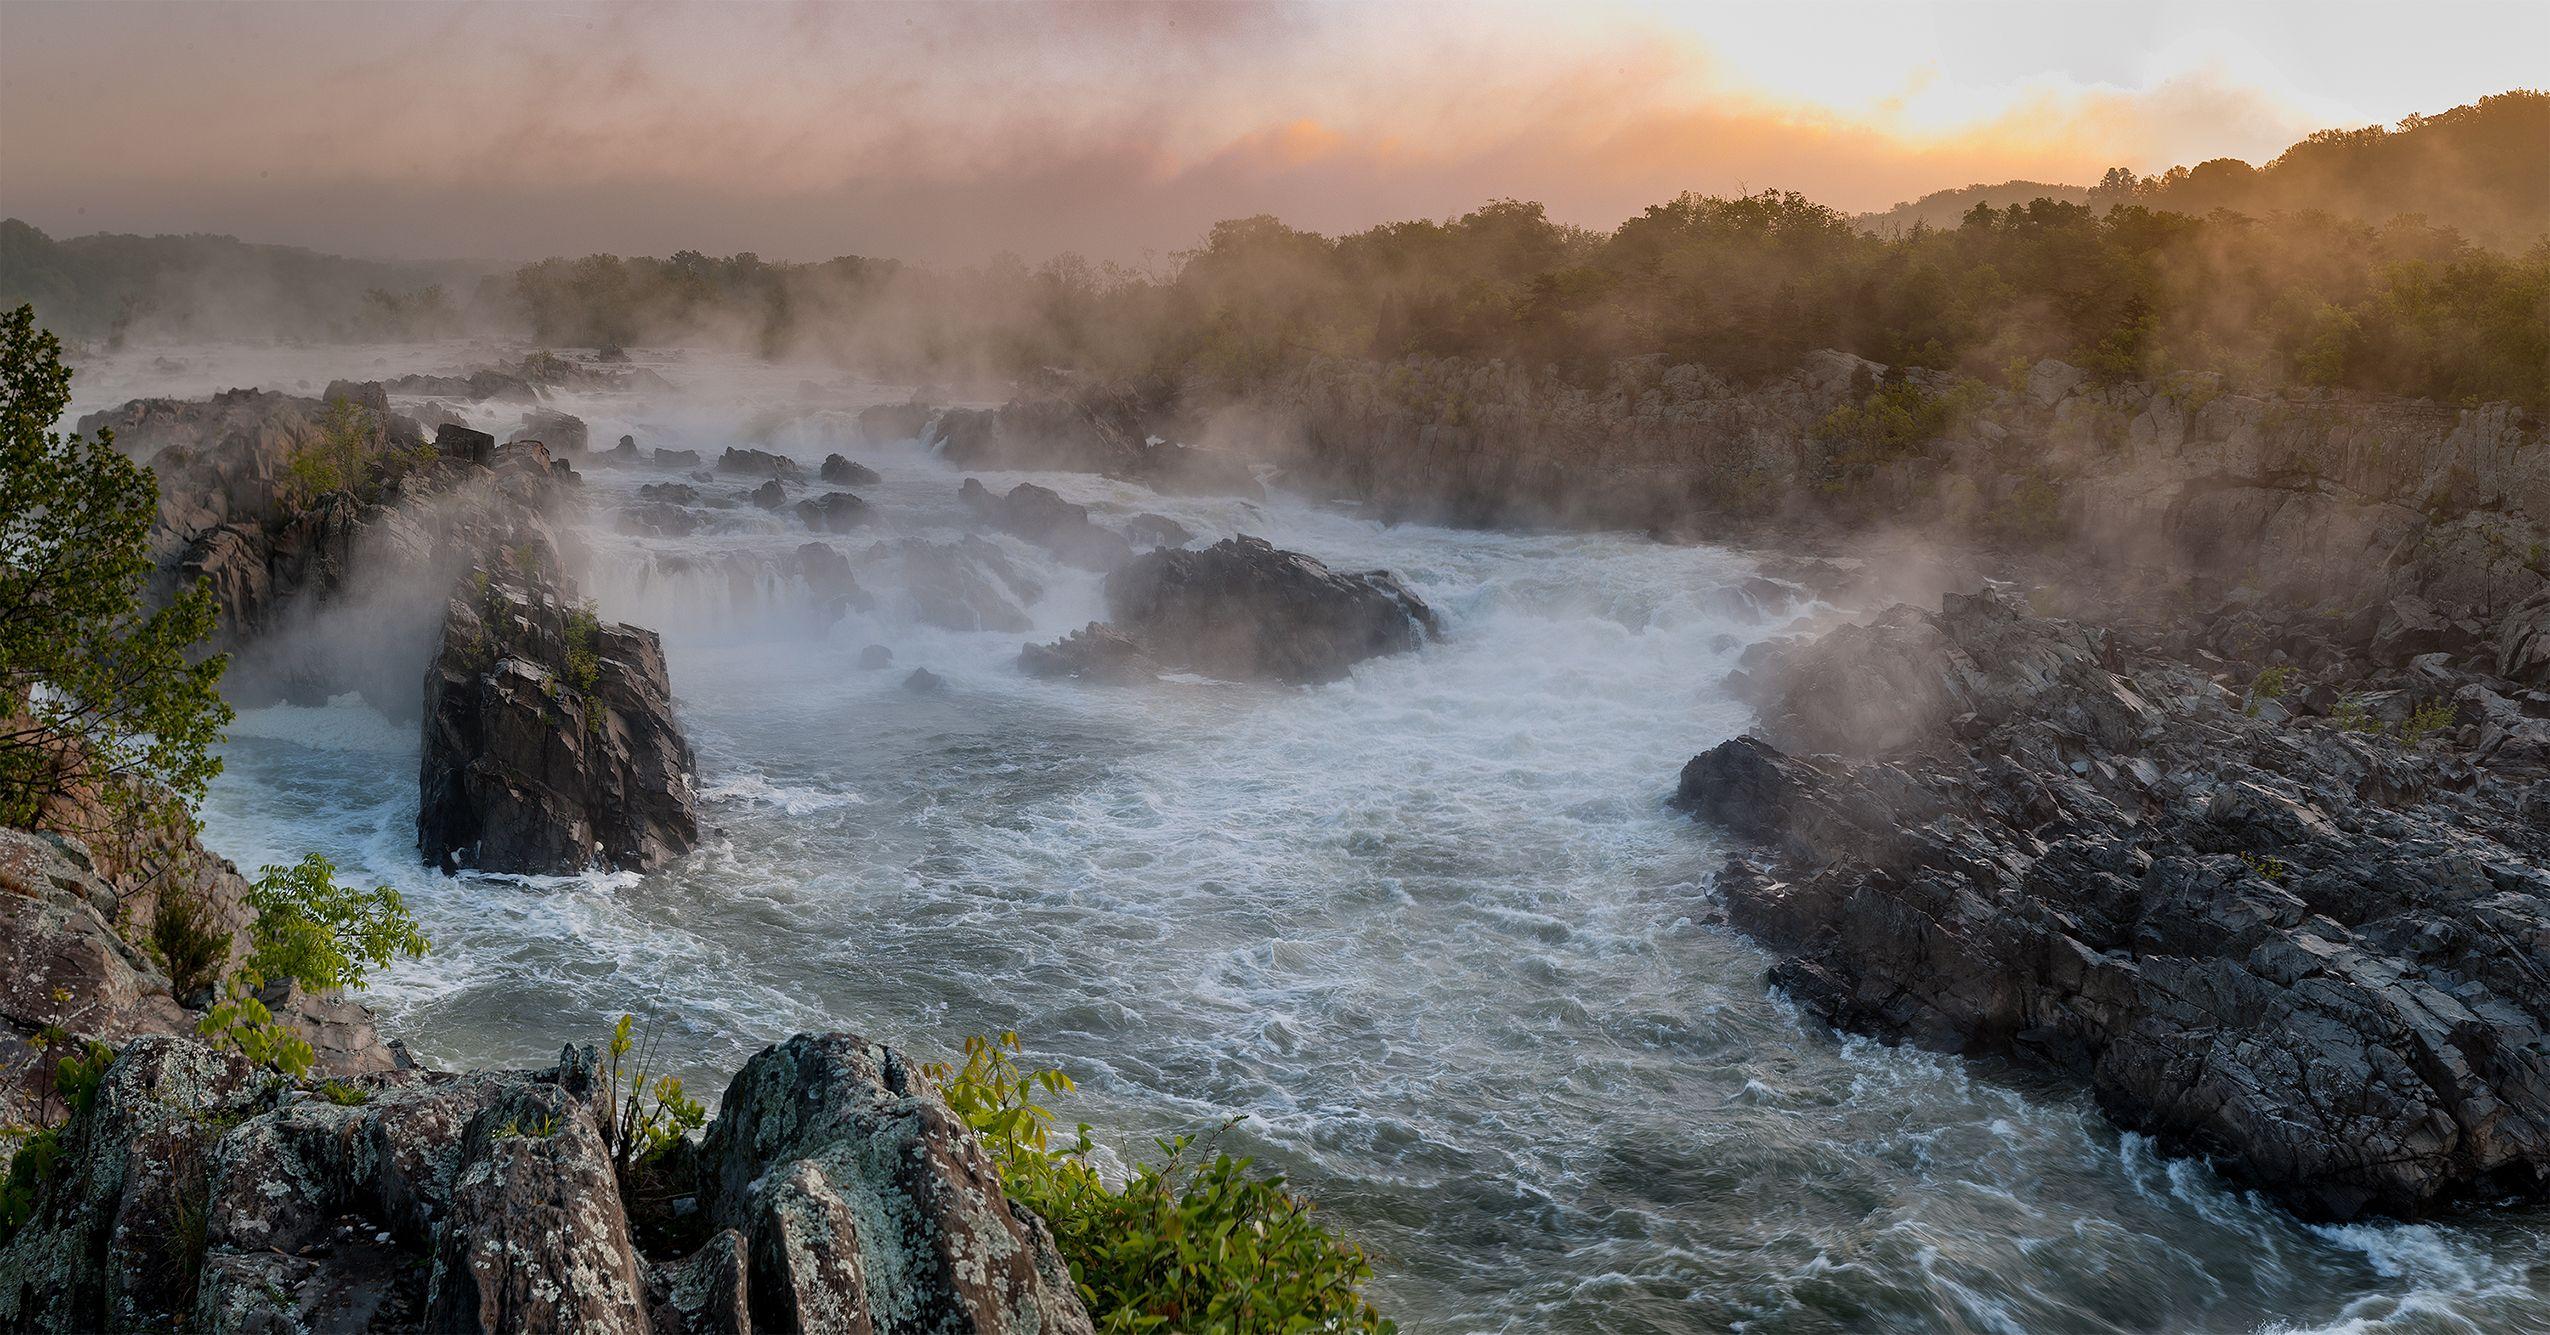 Sunrise, Great Falls of the Potomac.jpg